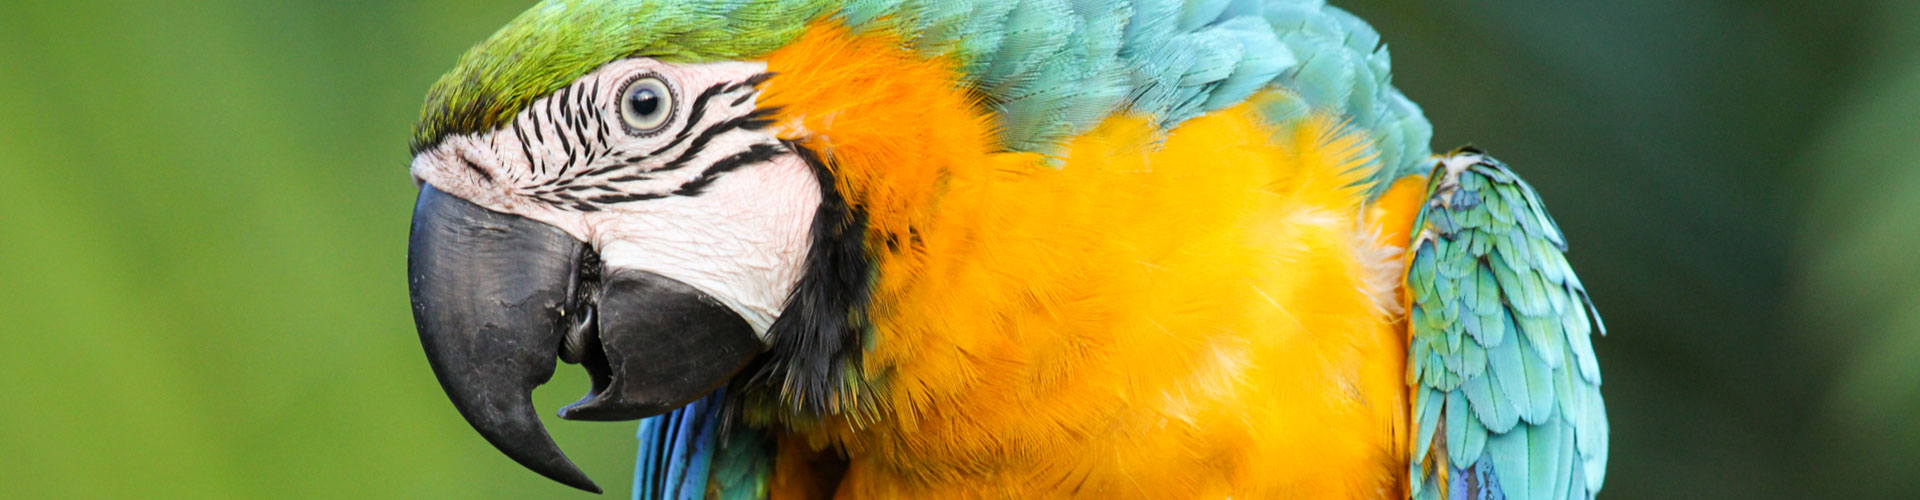 Foto: Papagei gelb blau